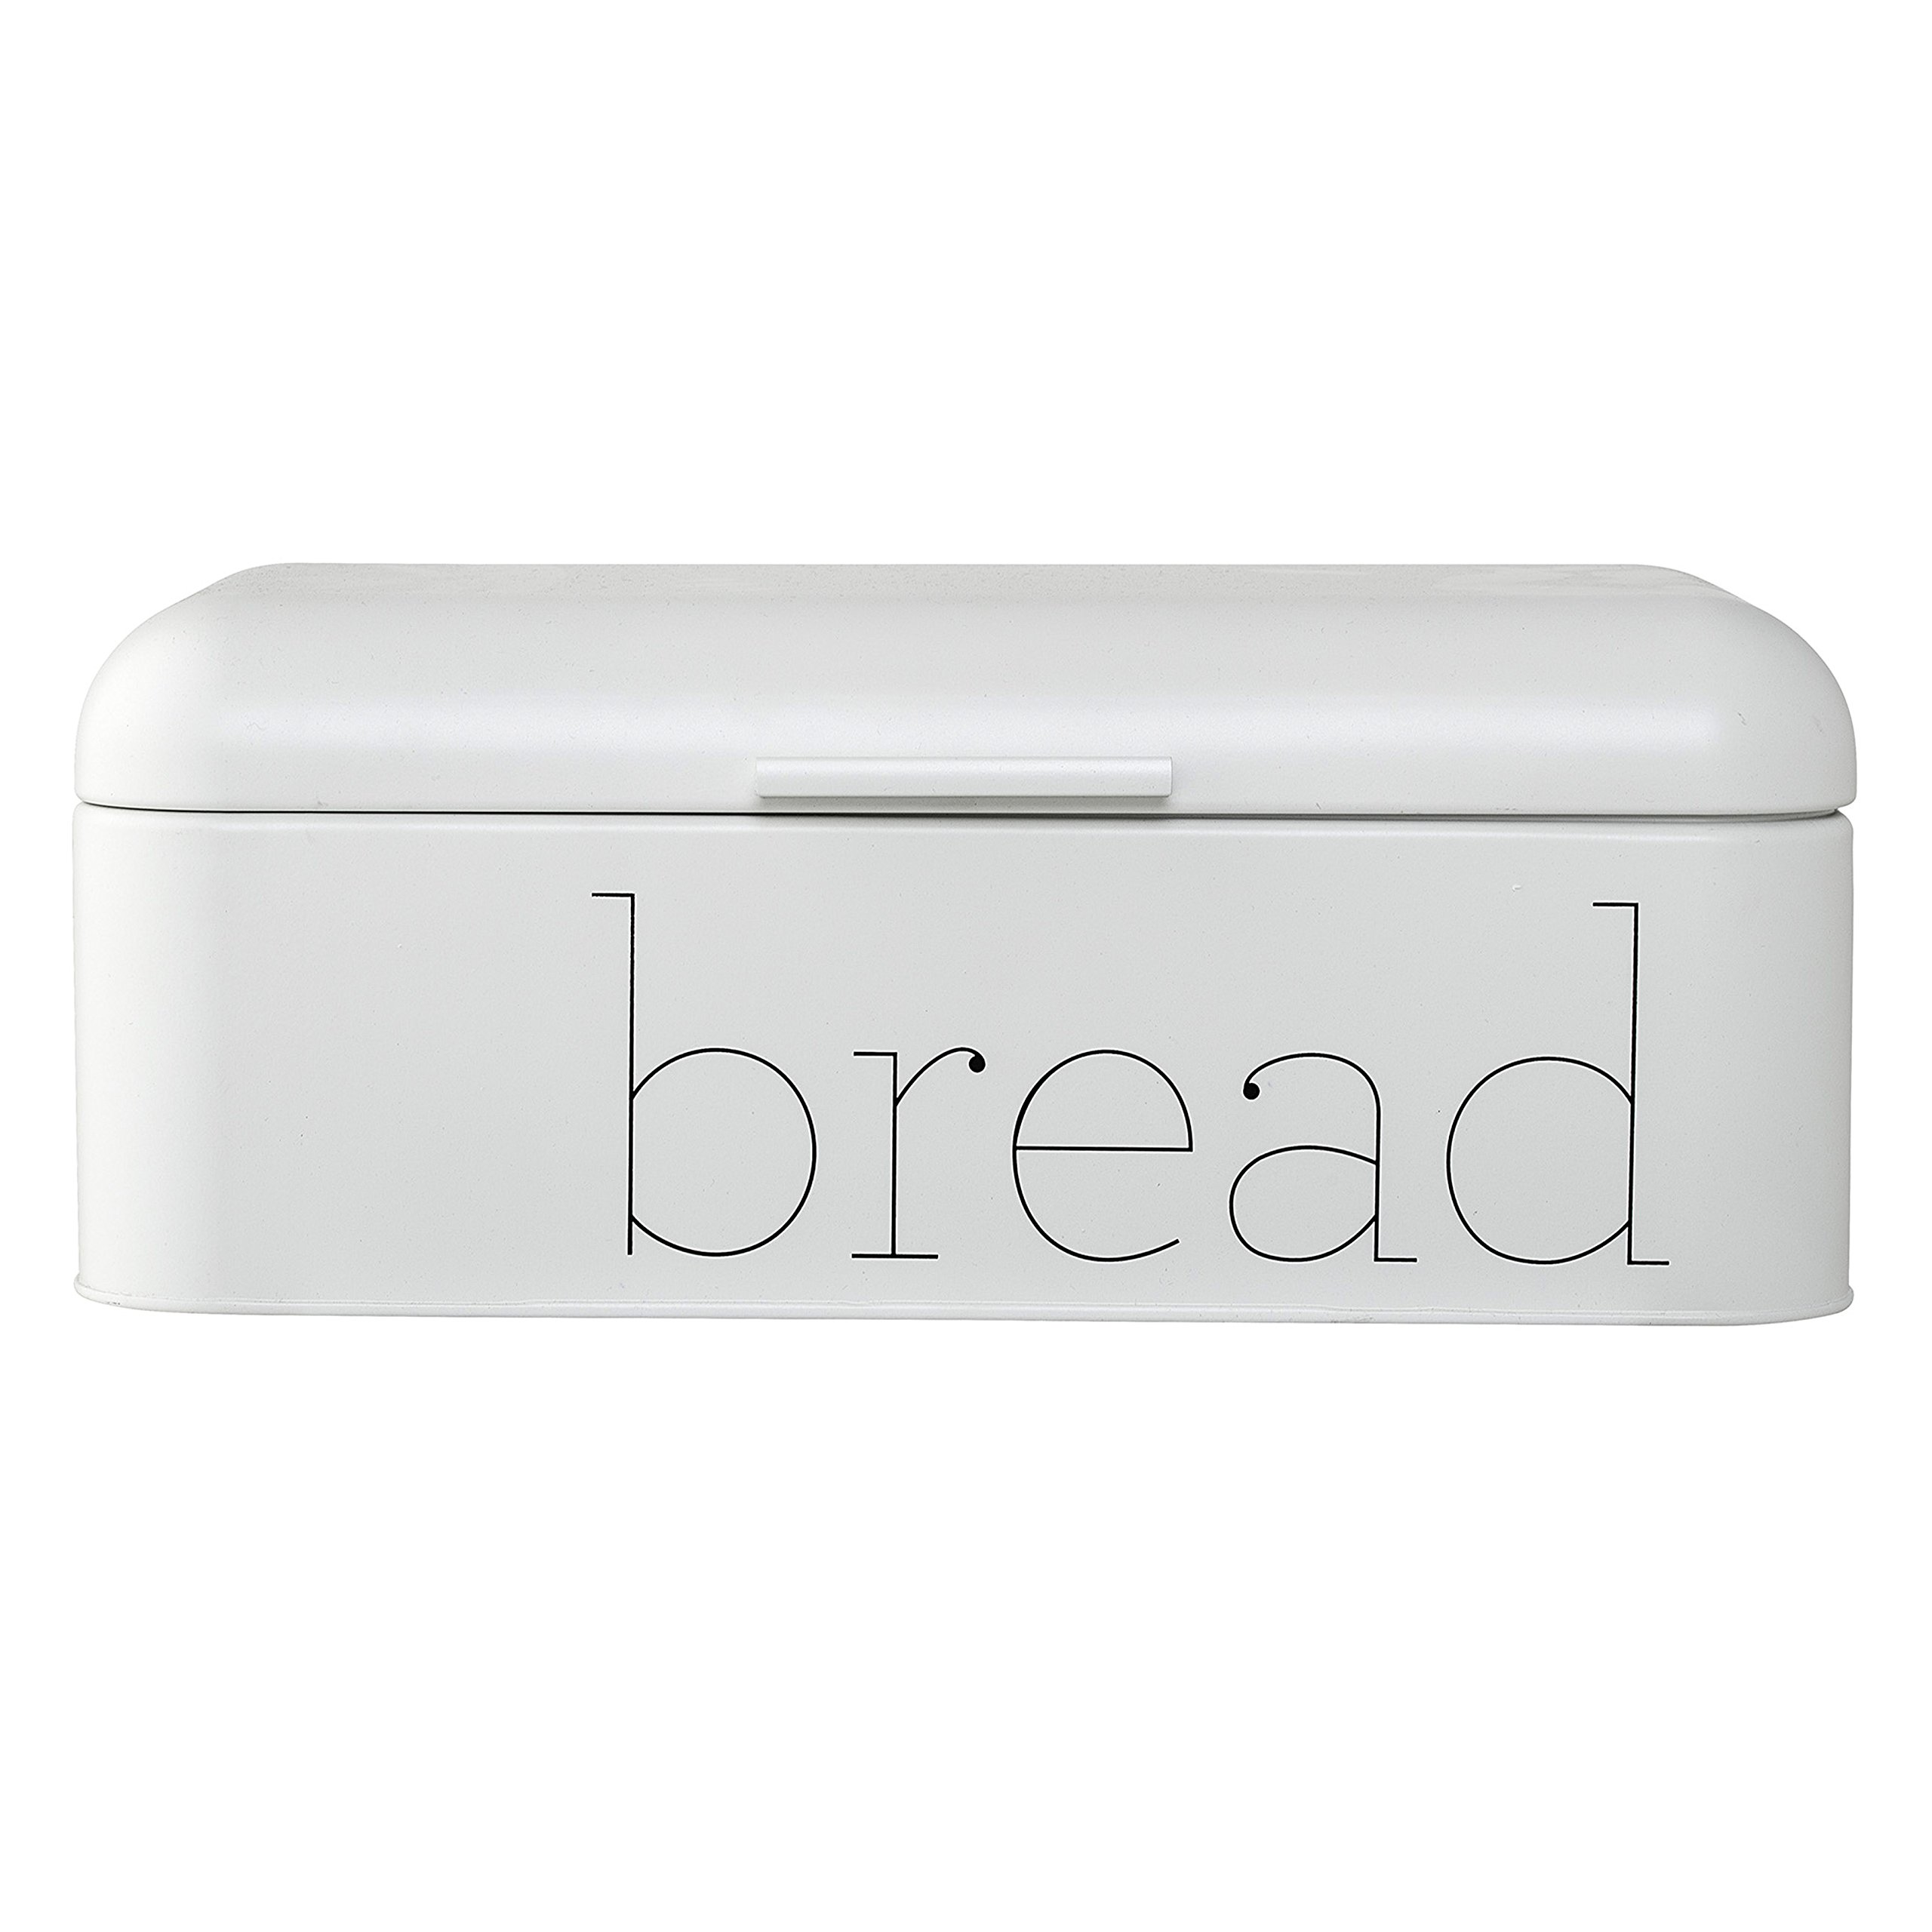 Bloomingville A97306648 Metal Bread Bin, White by Bloomingville